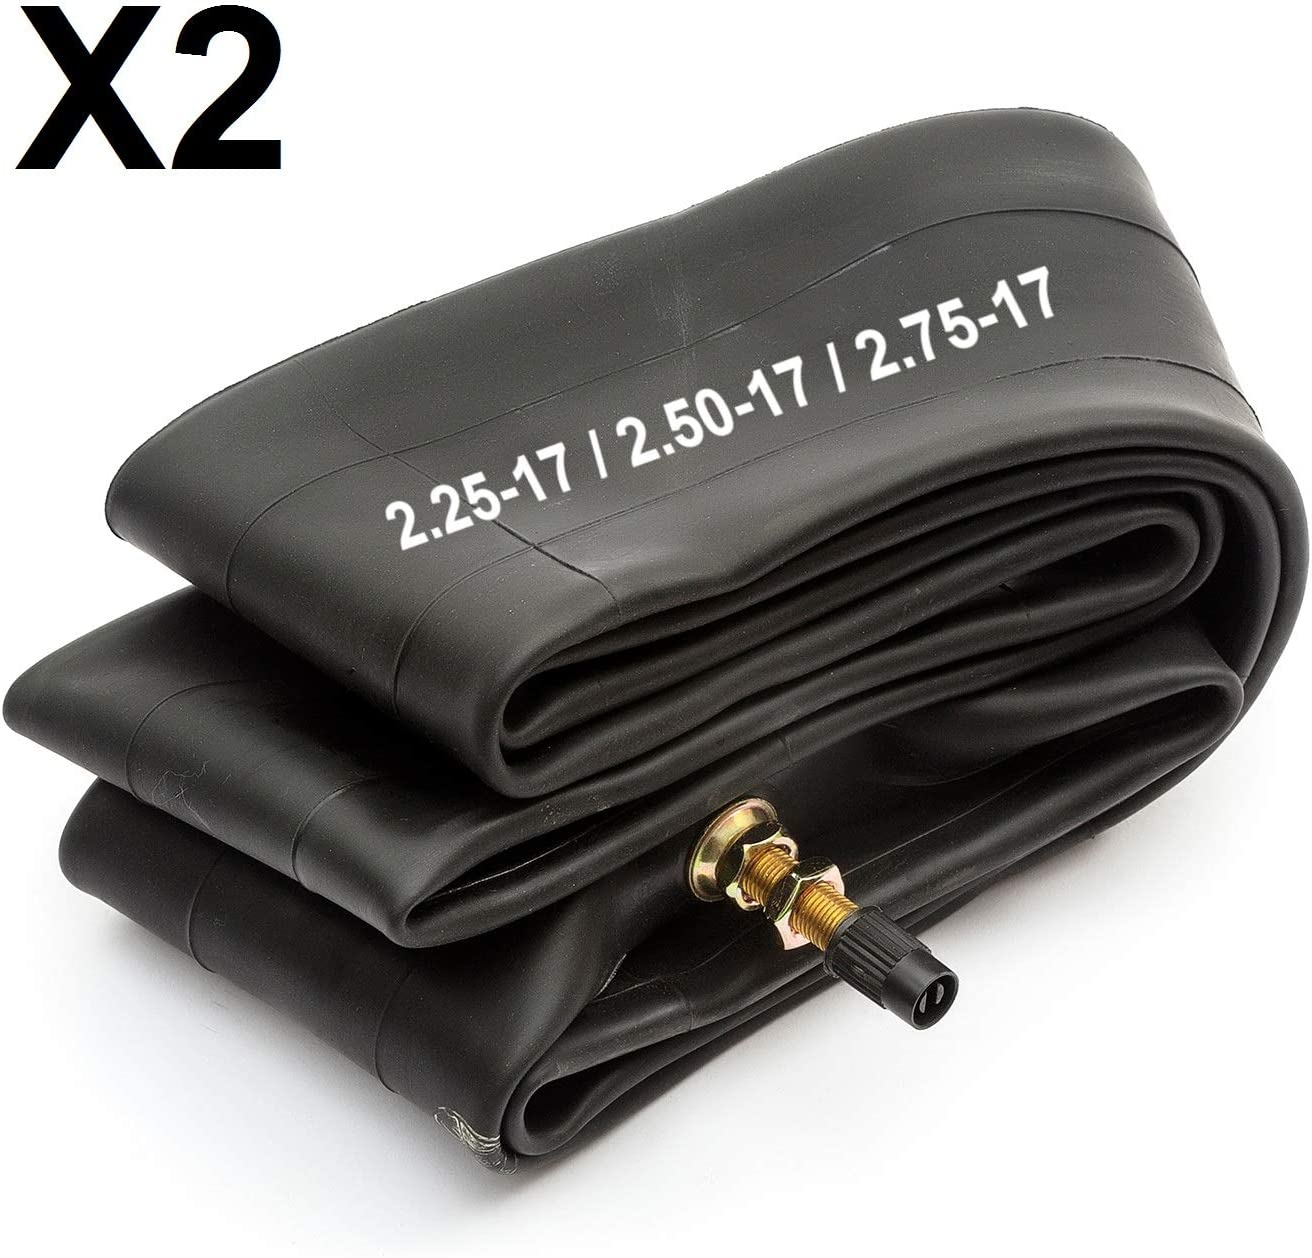 2x Innertube 2.25-17 2.50-17 2.75-17 17 Inch 70//100-17 Fits Puch Hercules Motorcycle